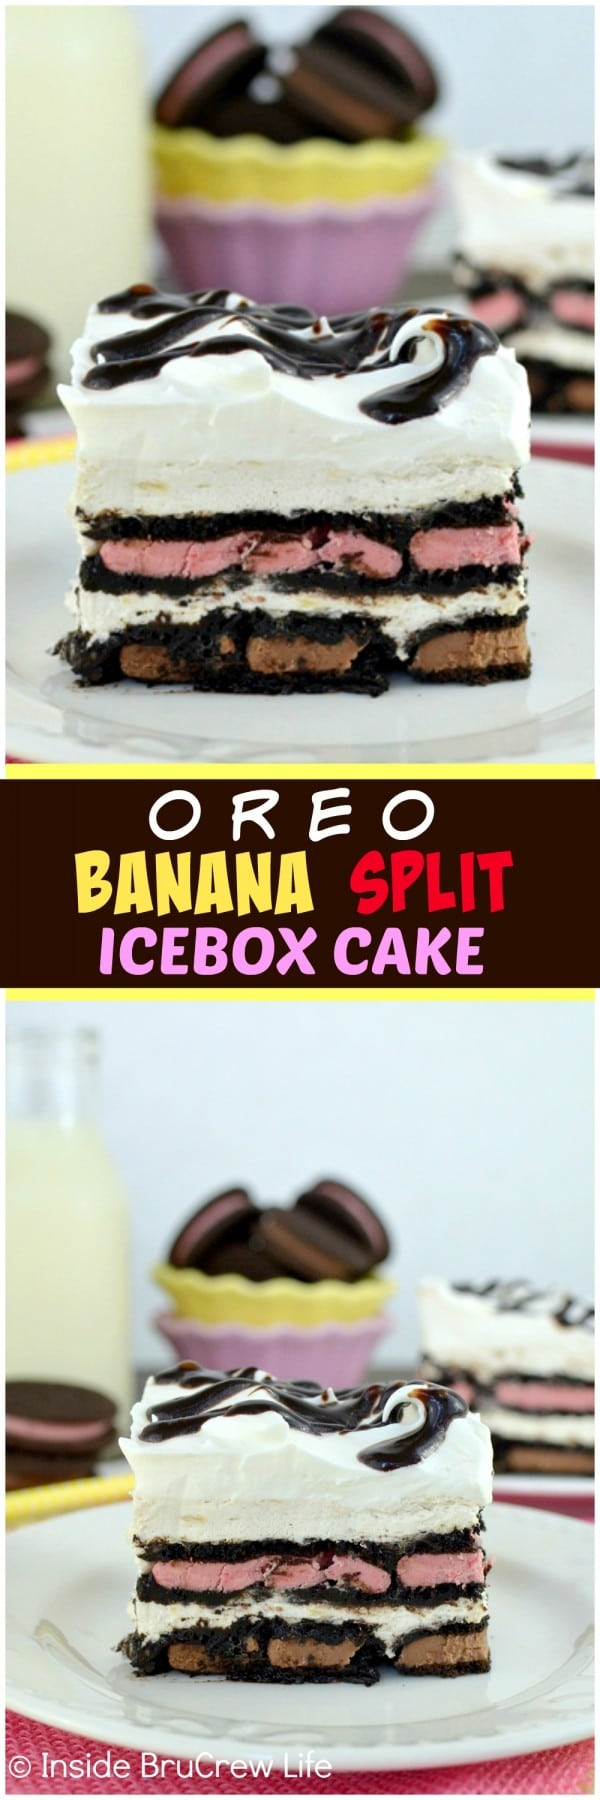 Oreo Banana Split Ice Box Cake - layers of cookies and banana cheesecake makes this an impressive no bake dessert. Awesome picnic recipe.